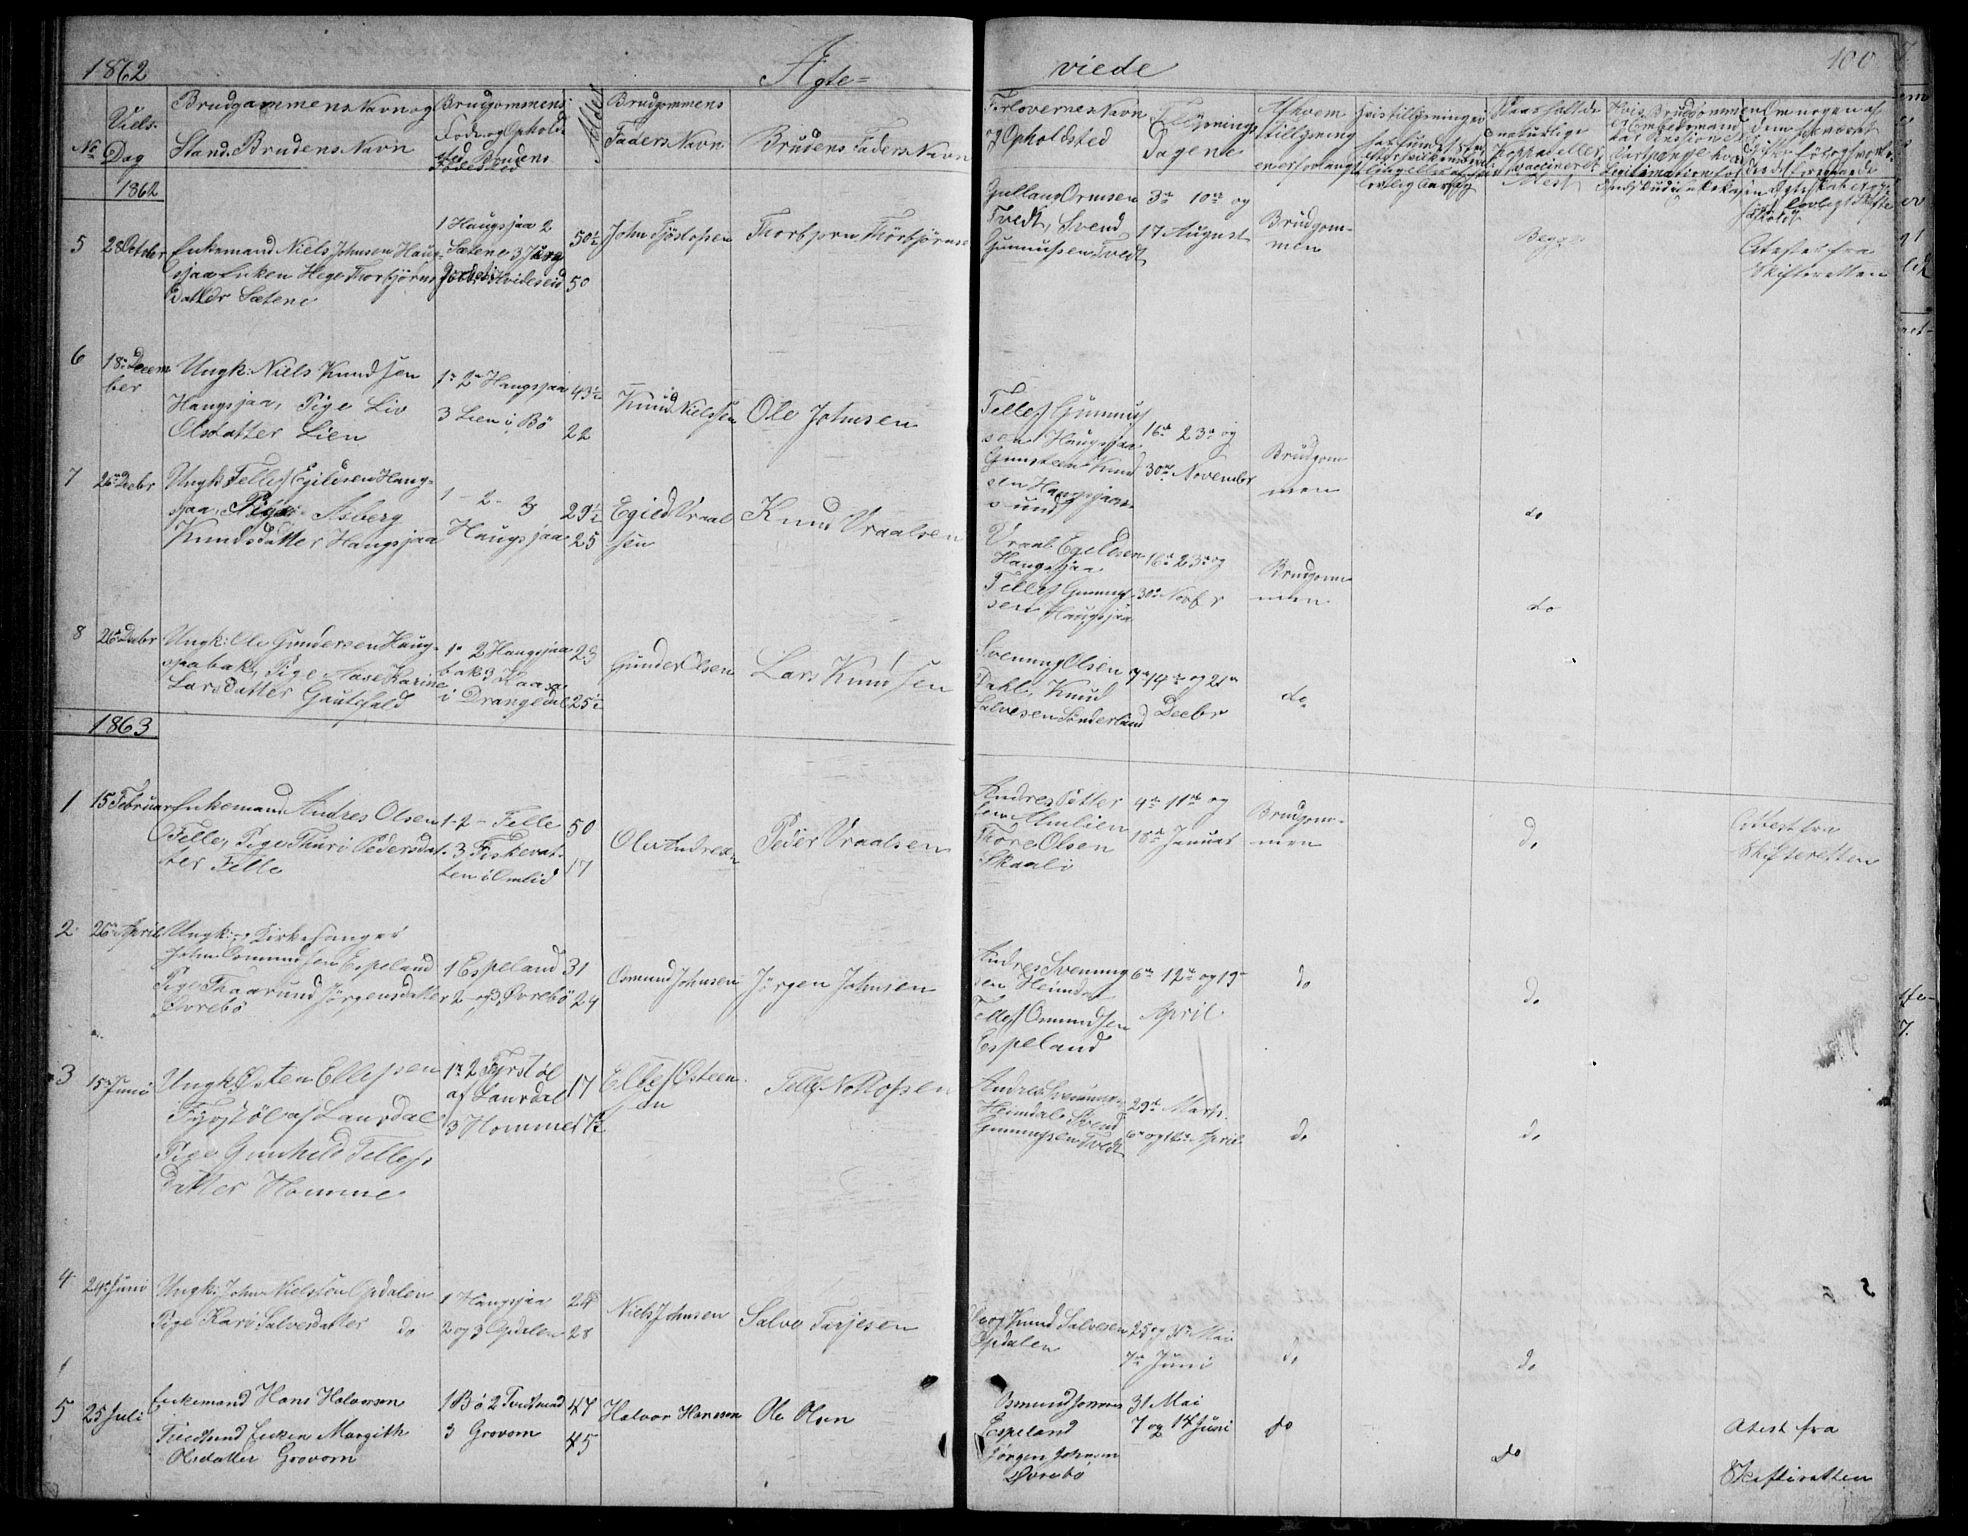 SAKO, Nissedal kirkebøker, G/Gb/L0002: Klokkerbok nr. II 2, 1863-1892, s. 100